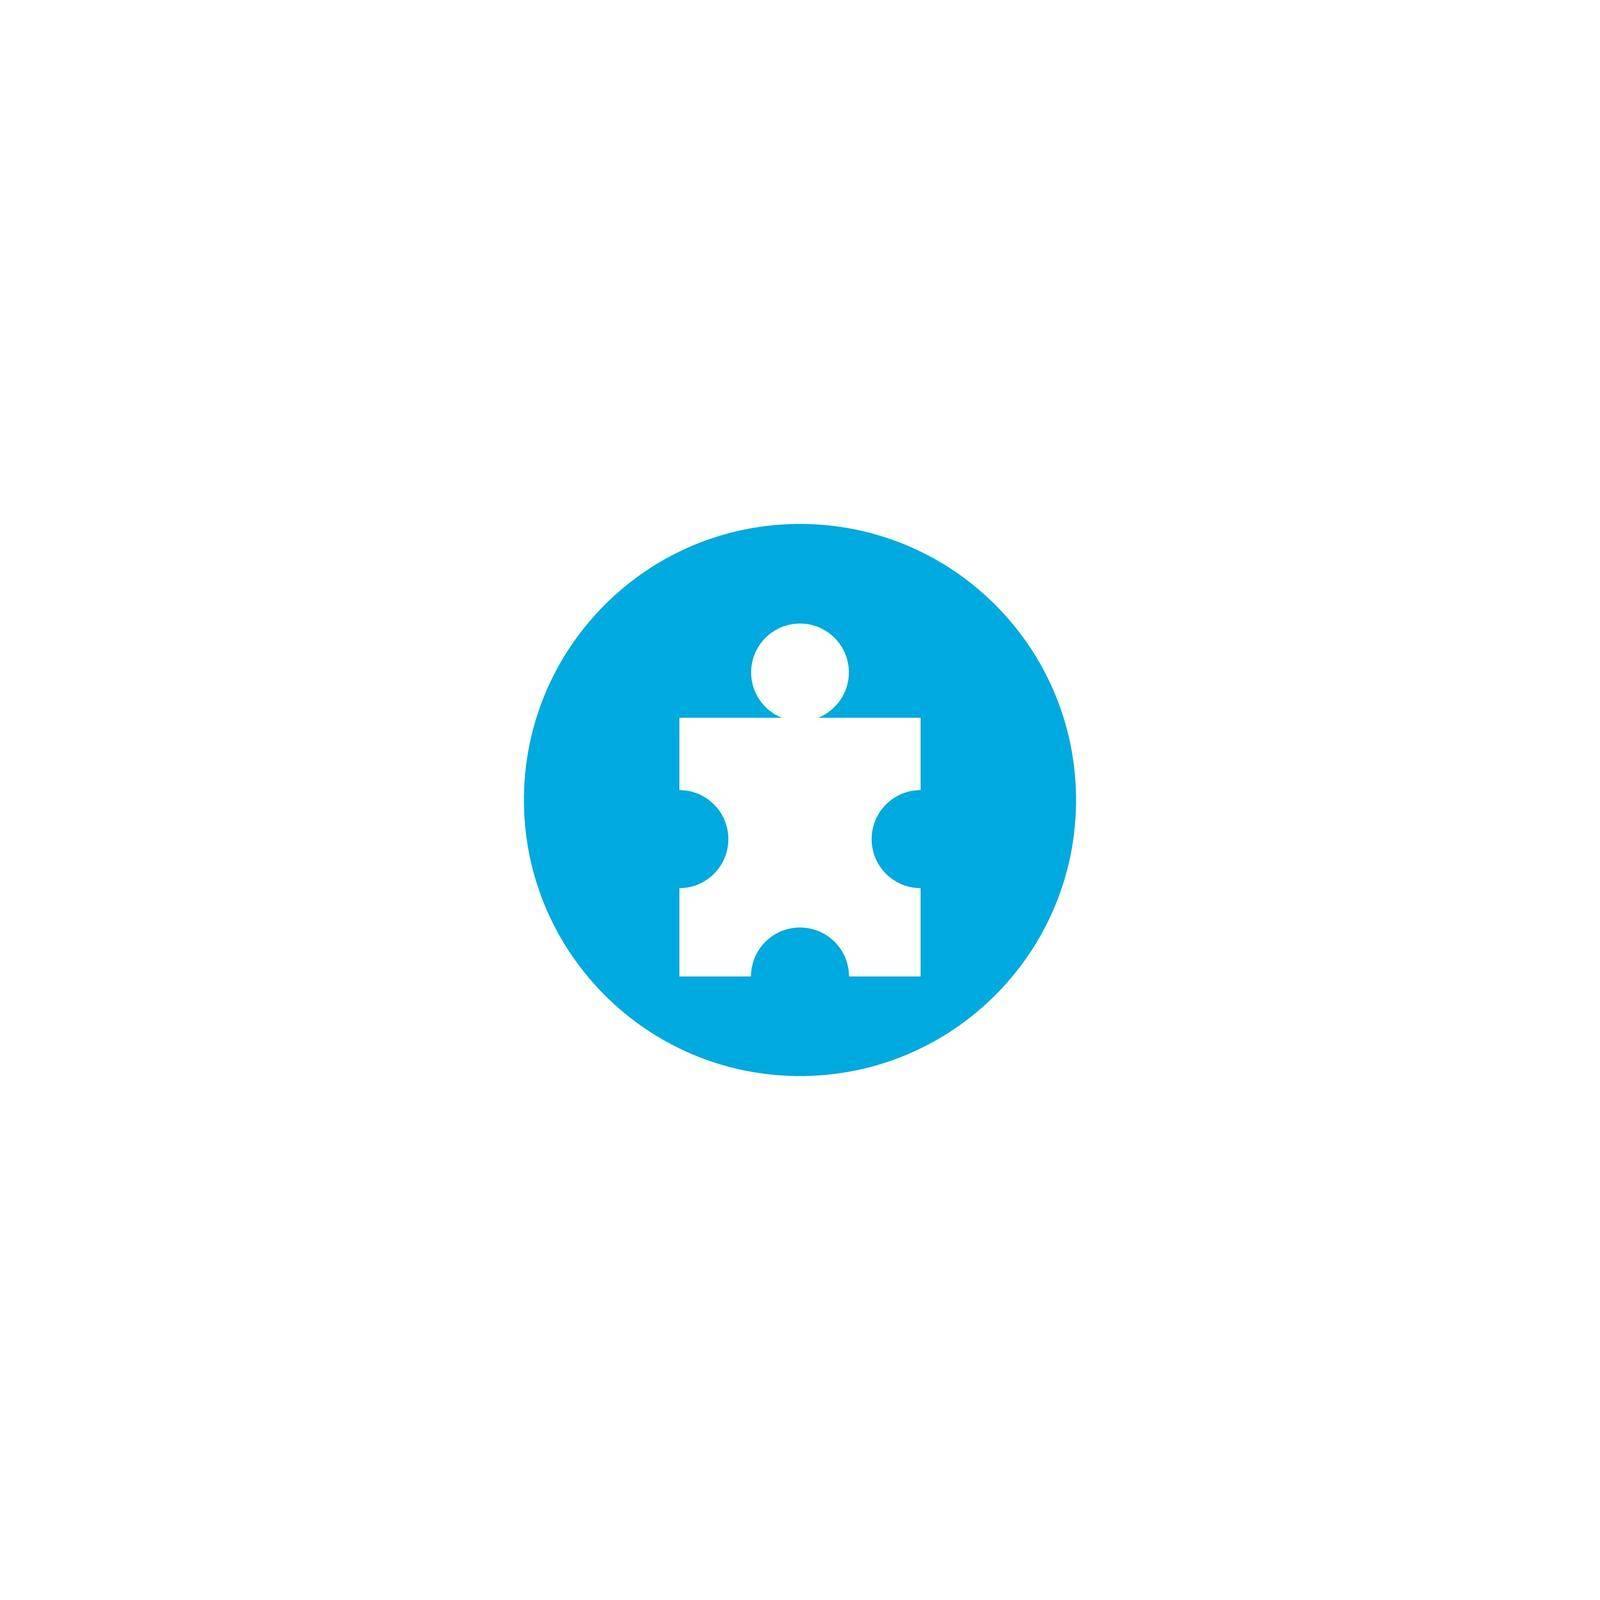 People puzzle illustration vector design